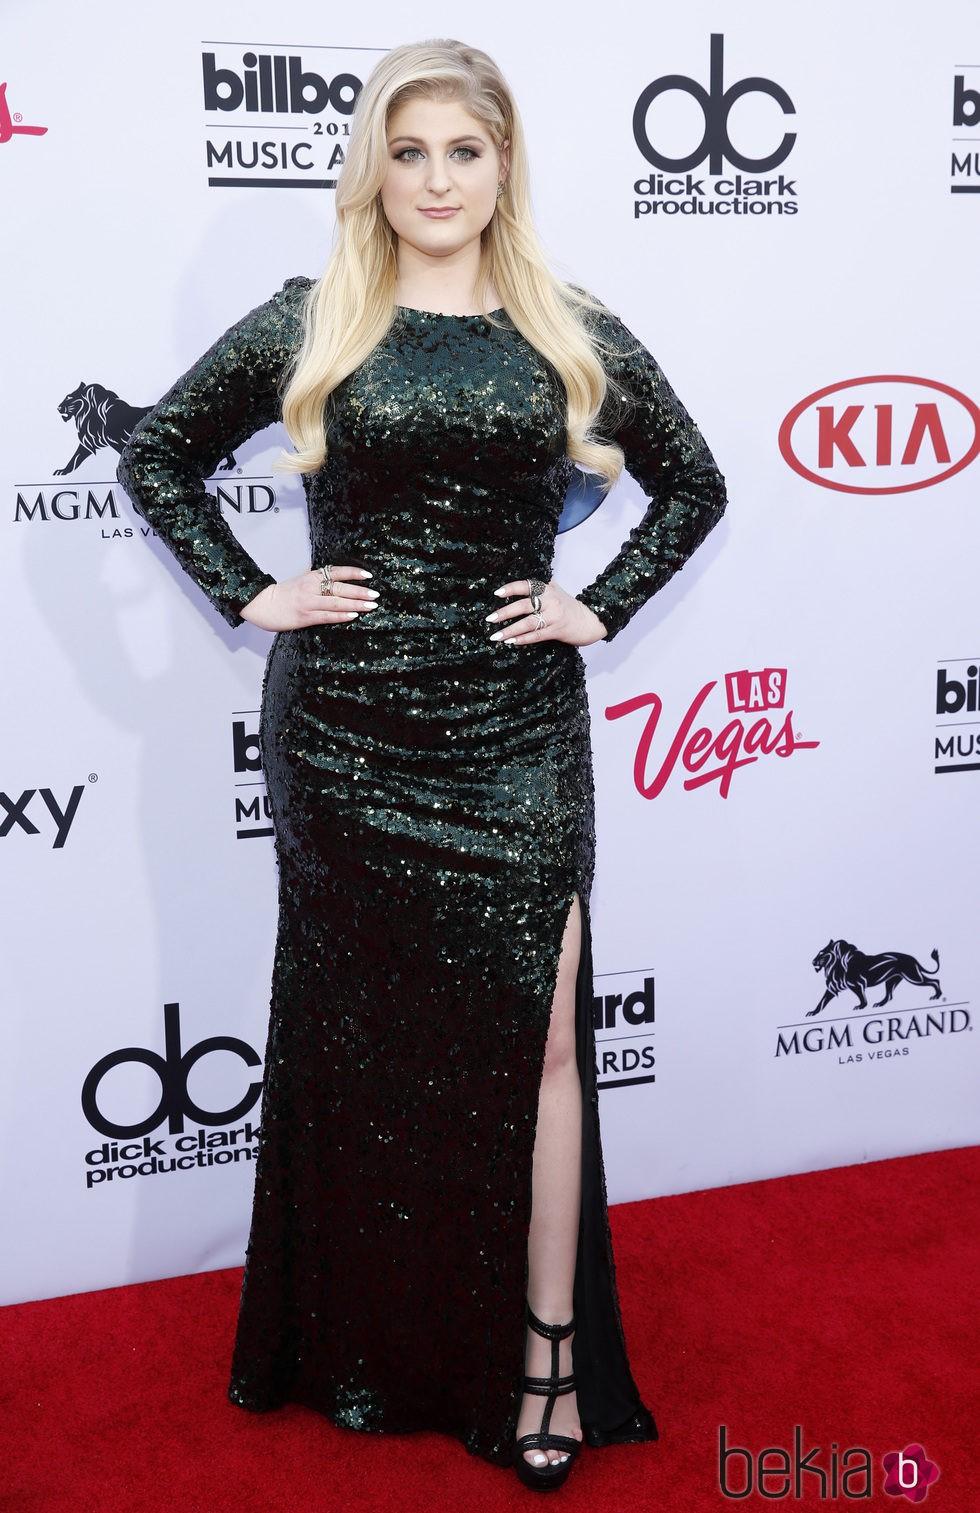 Meghan Trainor en los Billboard Music Awards 2015